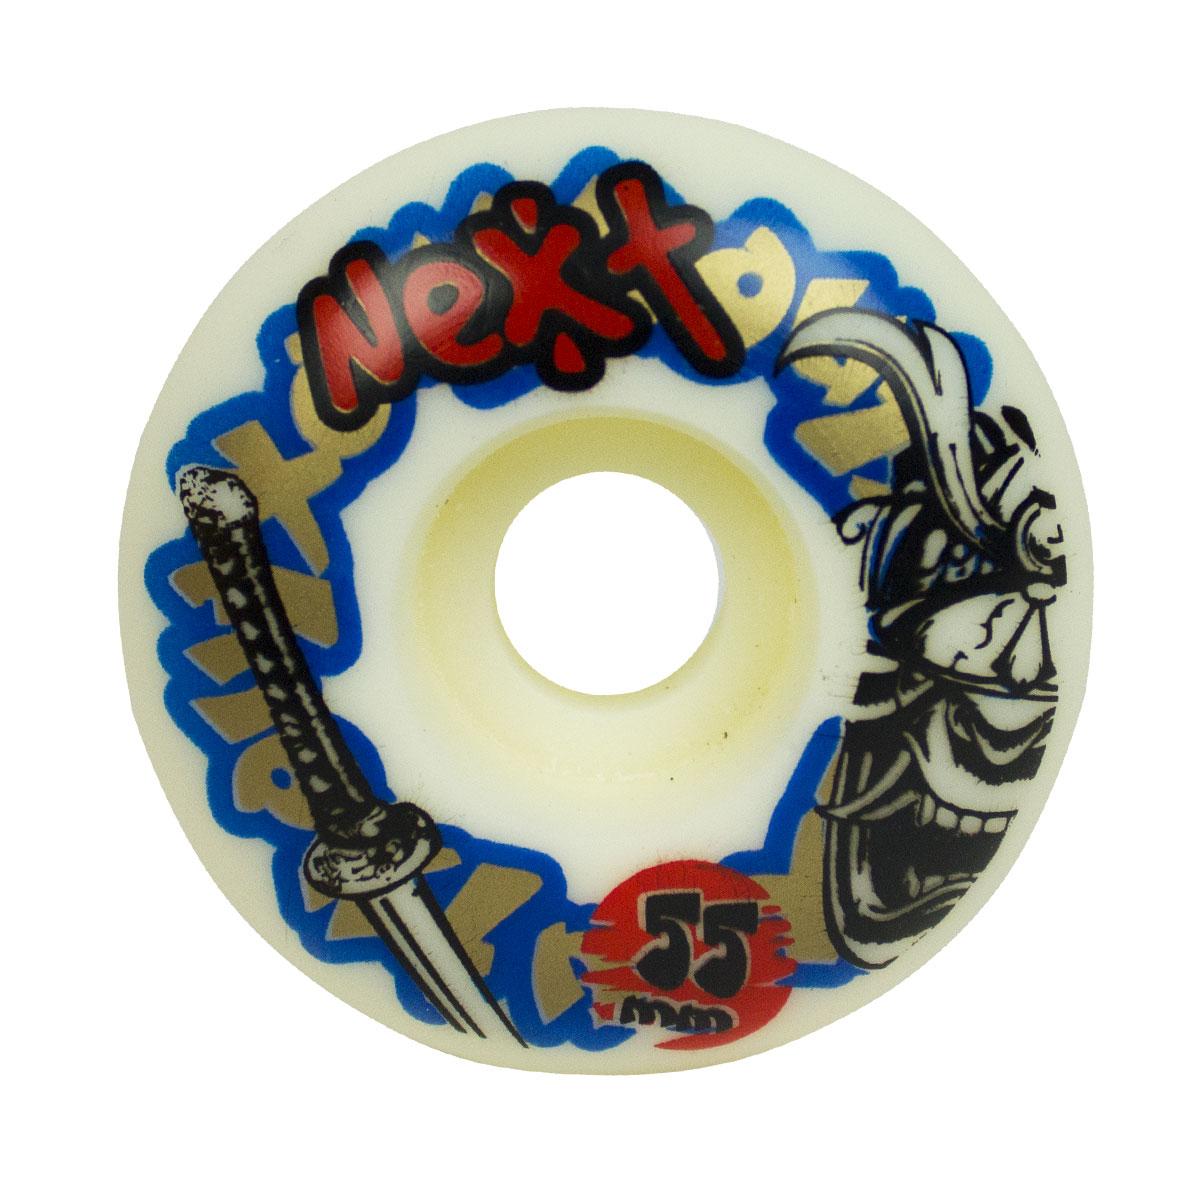 Rodinha Roda Skate Next (Moska) 55mm 101A Dura e Veloz